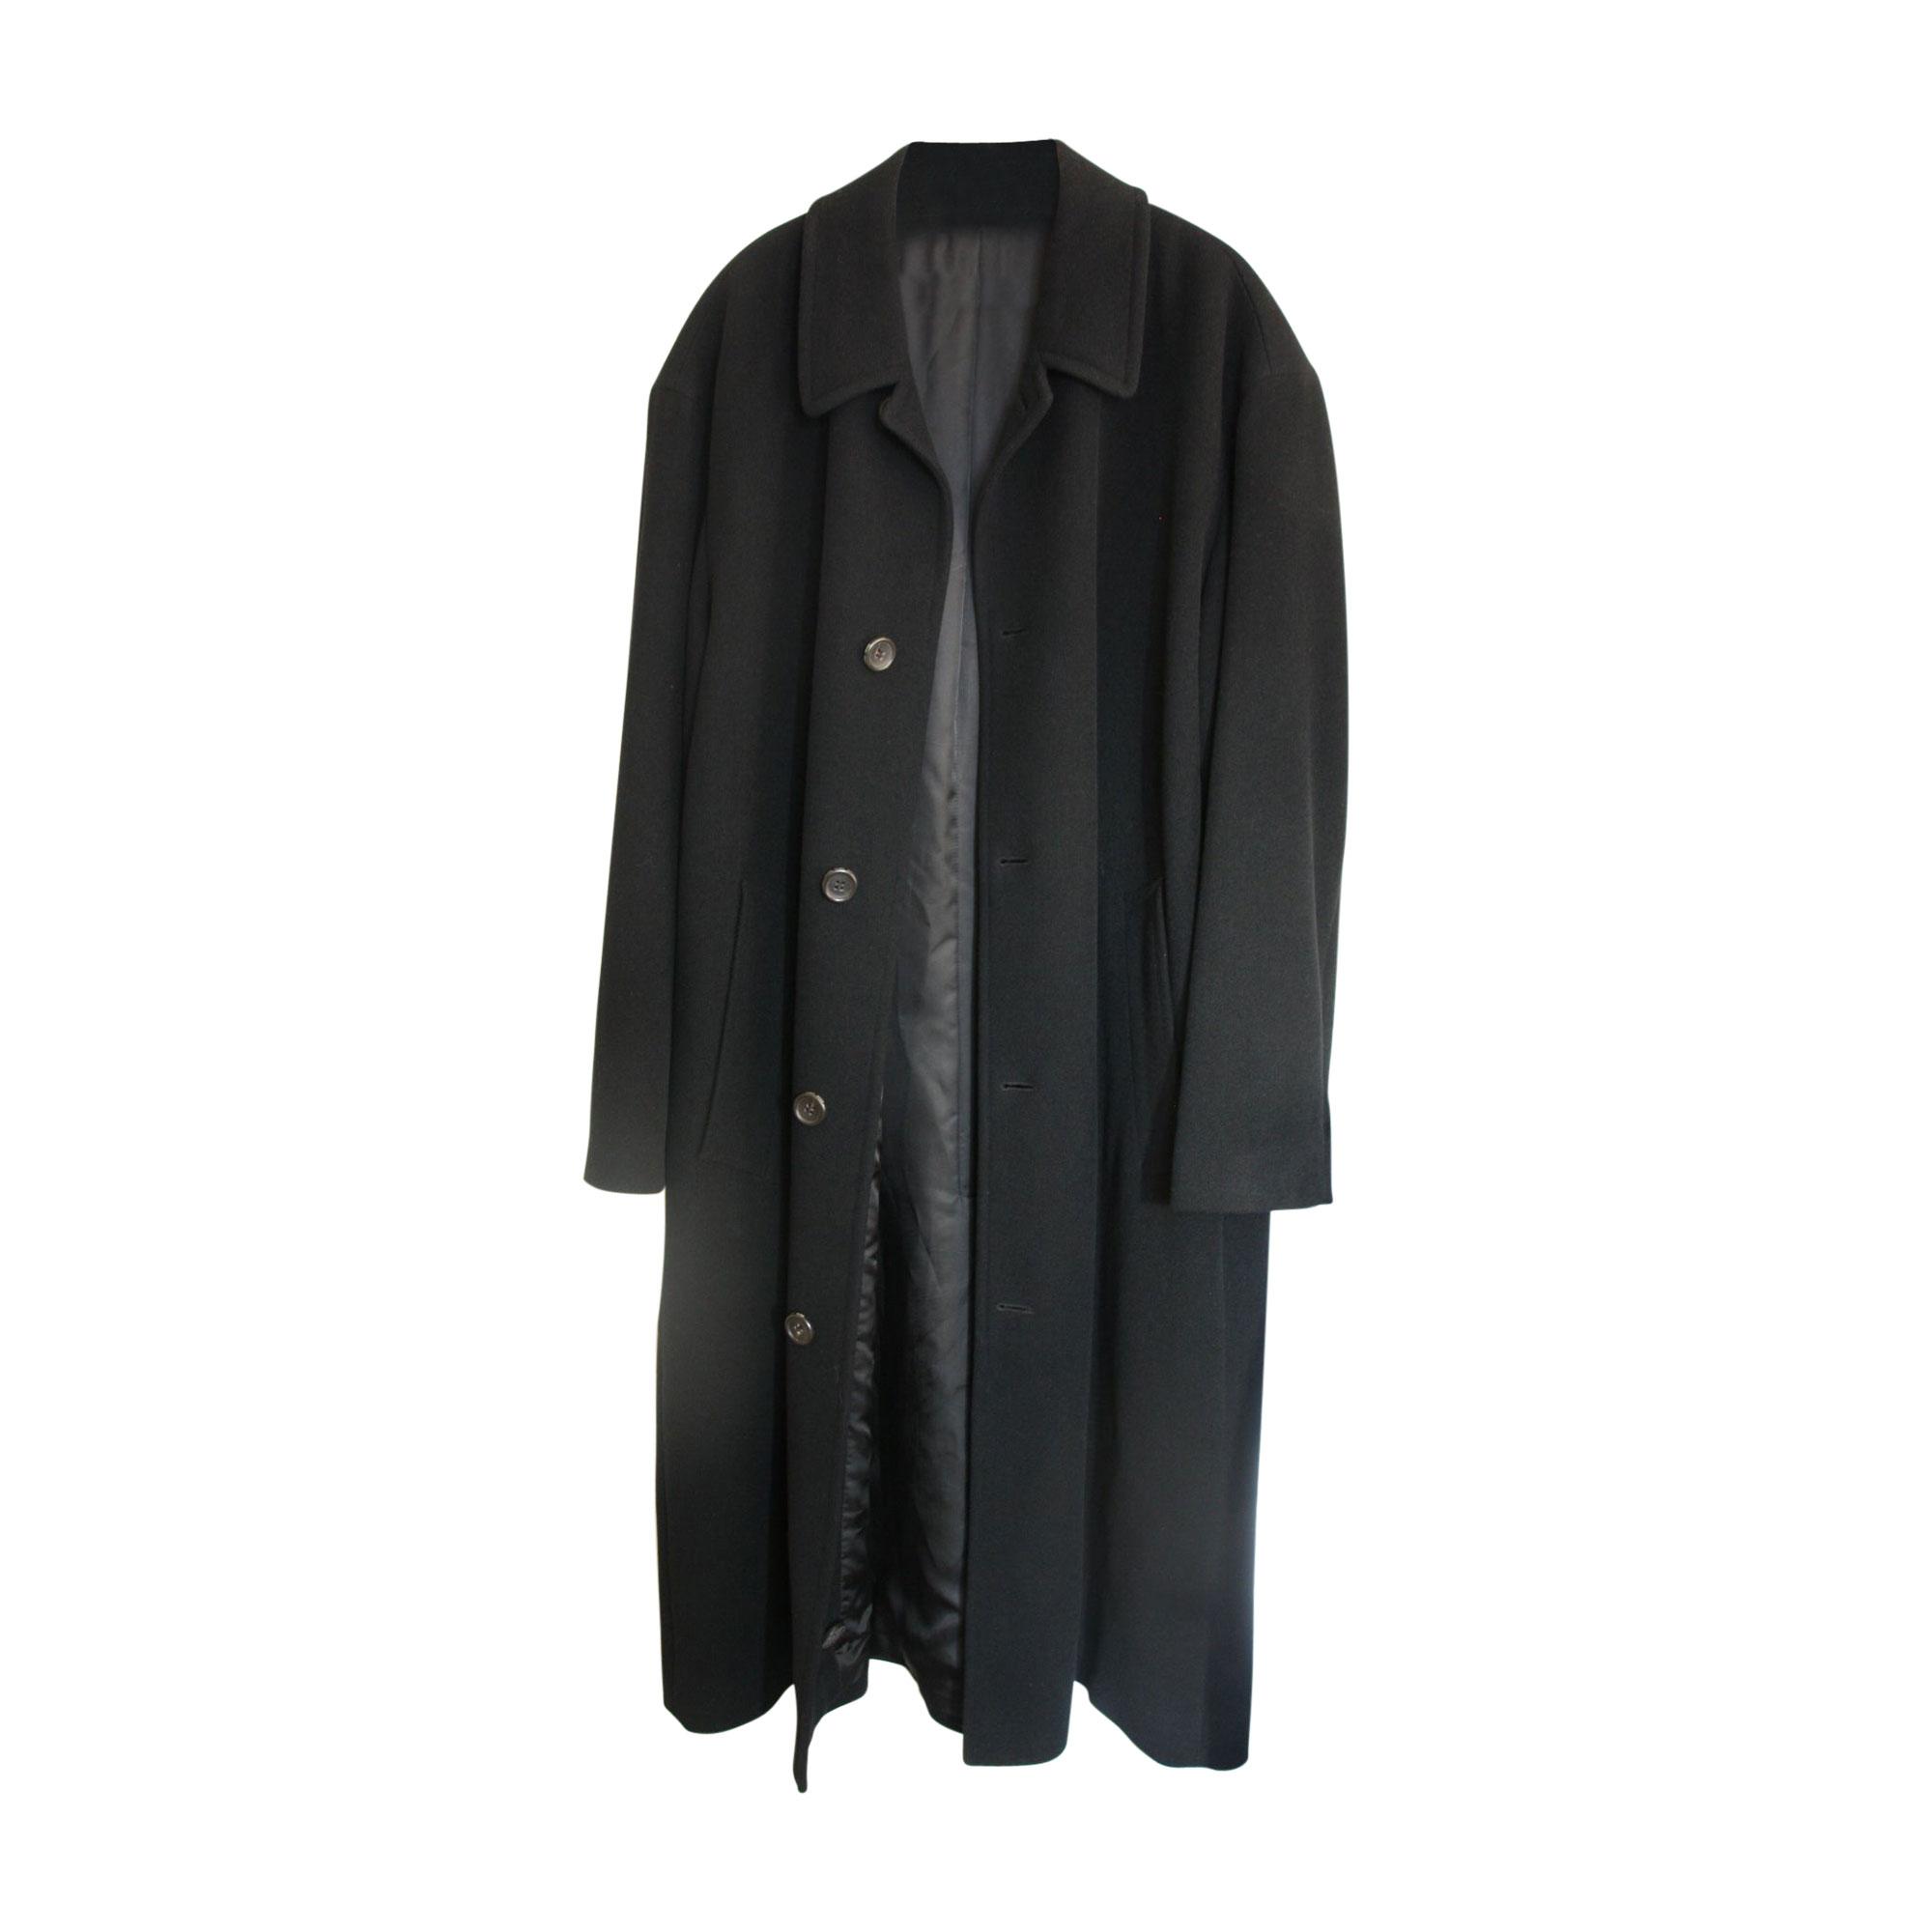 Manteau HUGO BOSS Noir